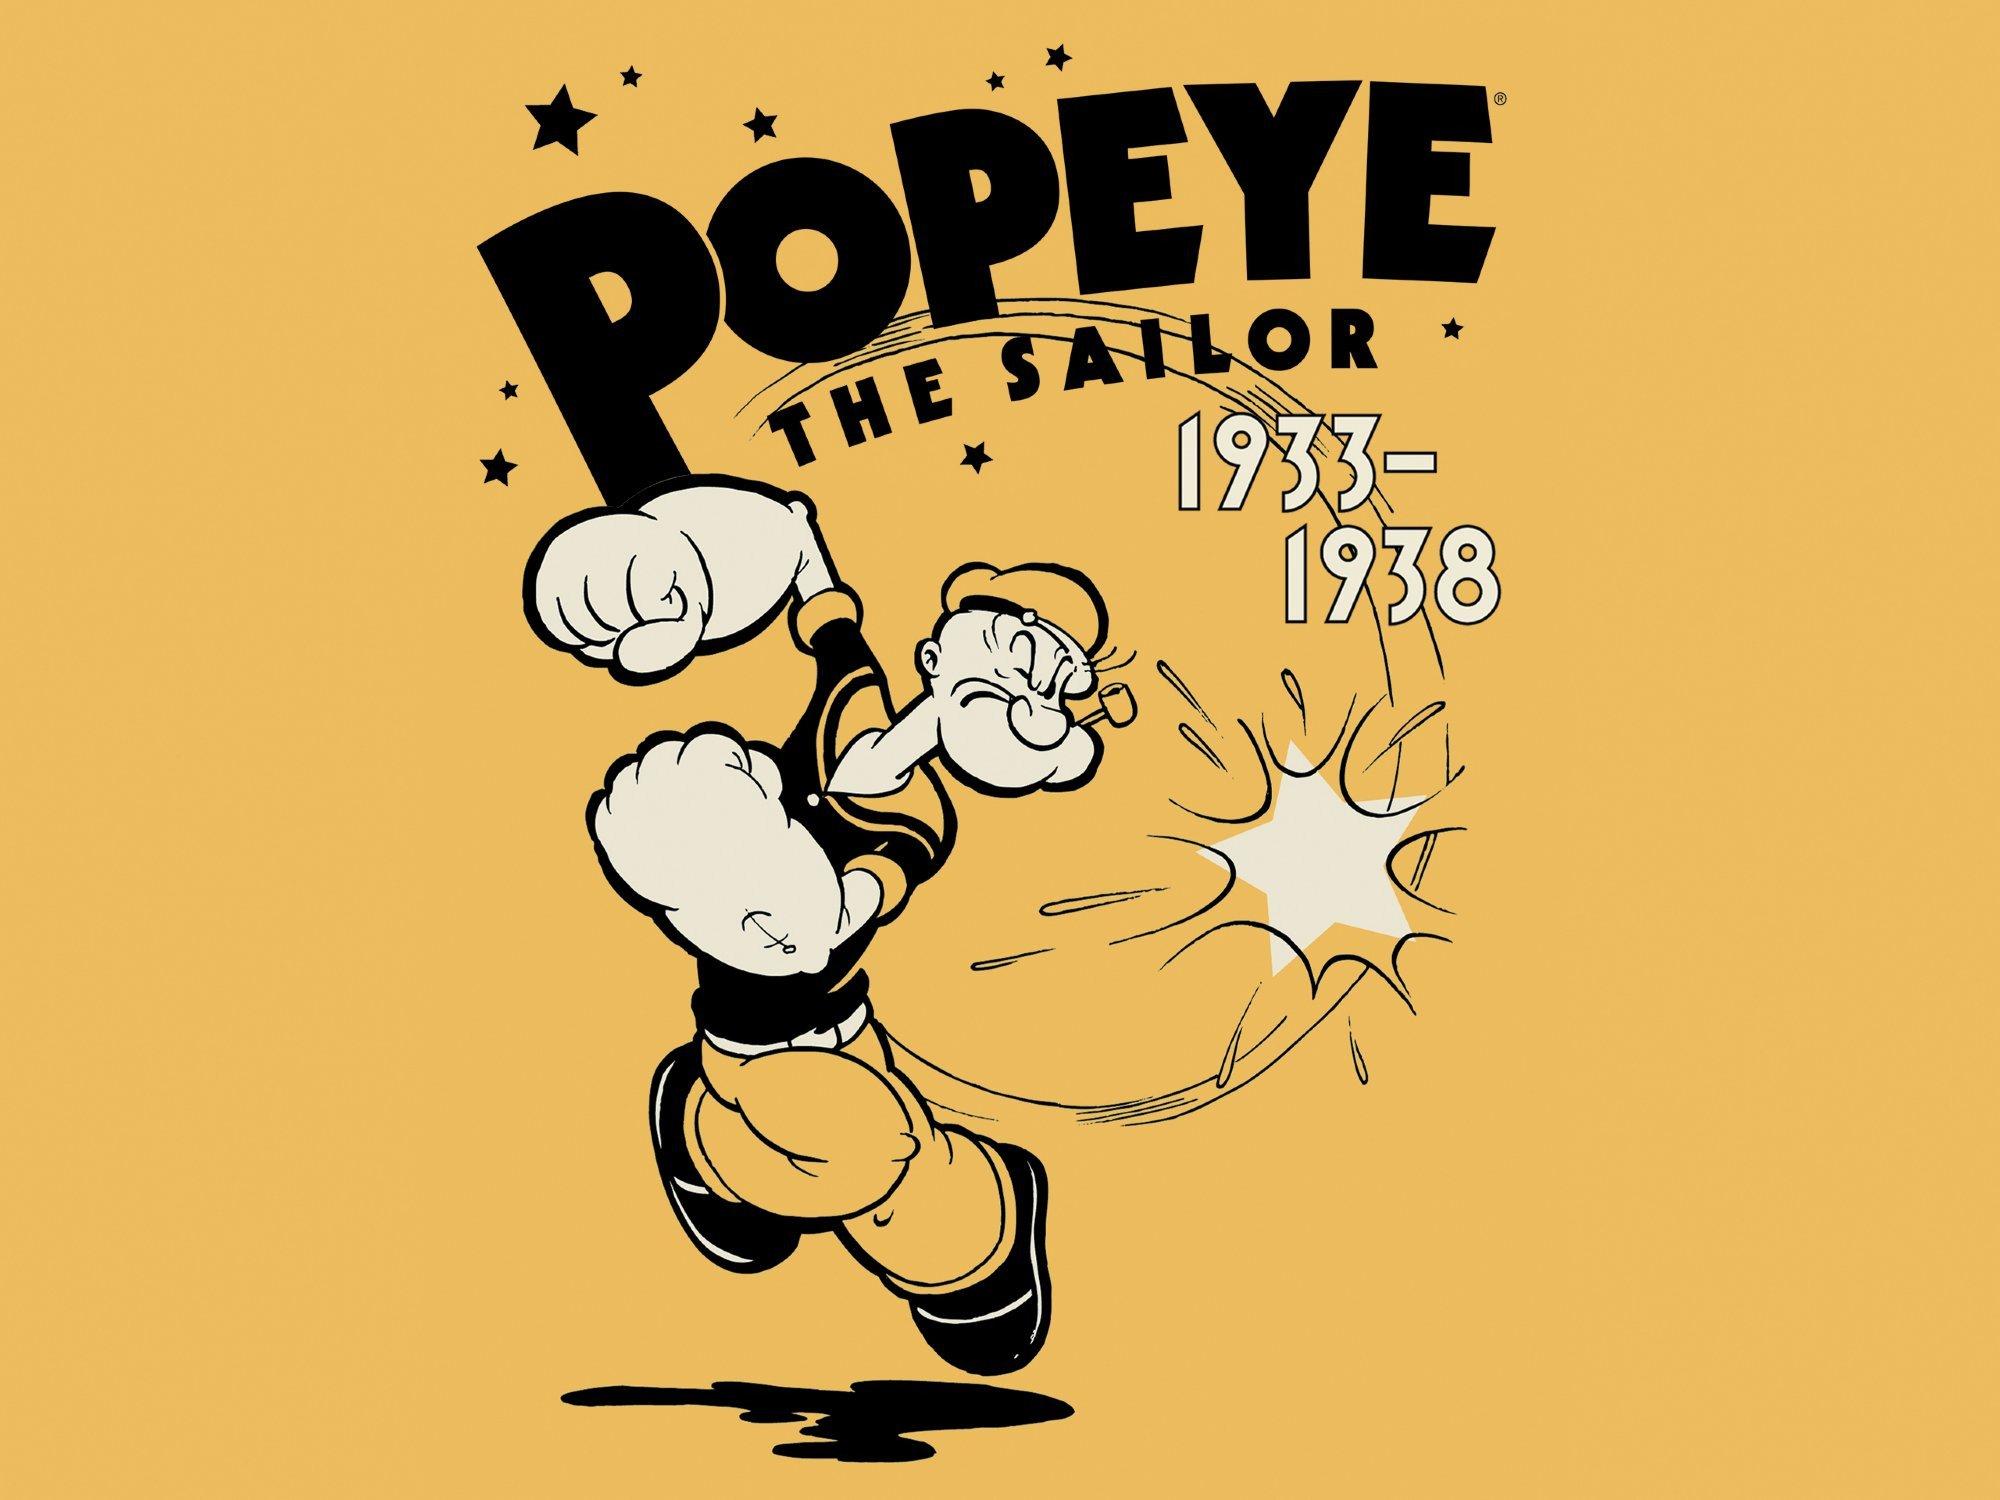 Amazon Popeye The Sailor Volume 1 1933 1938 Amazon Digital